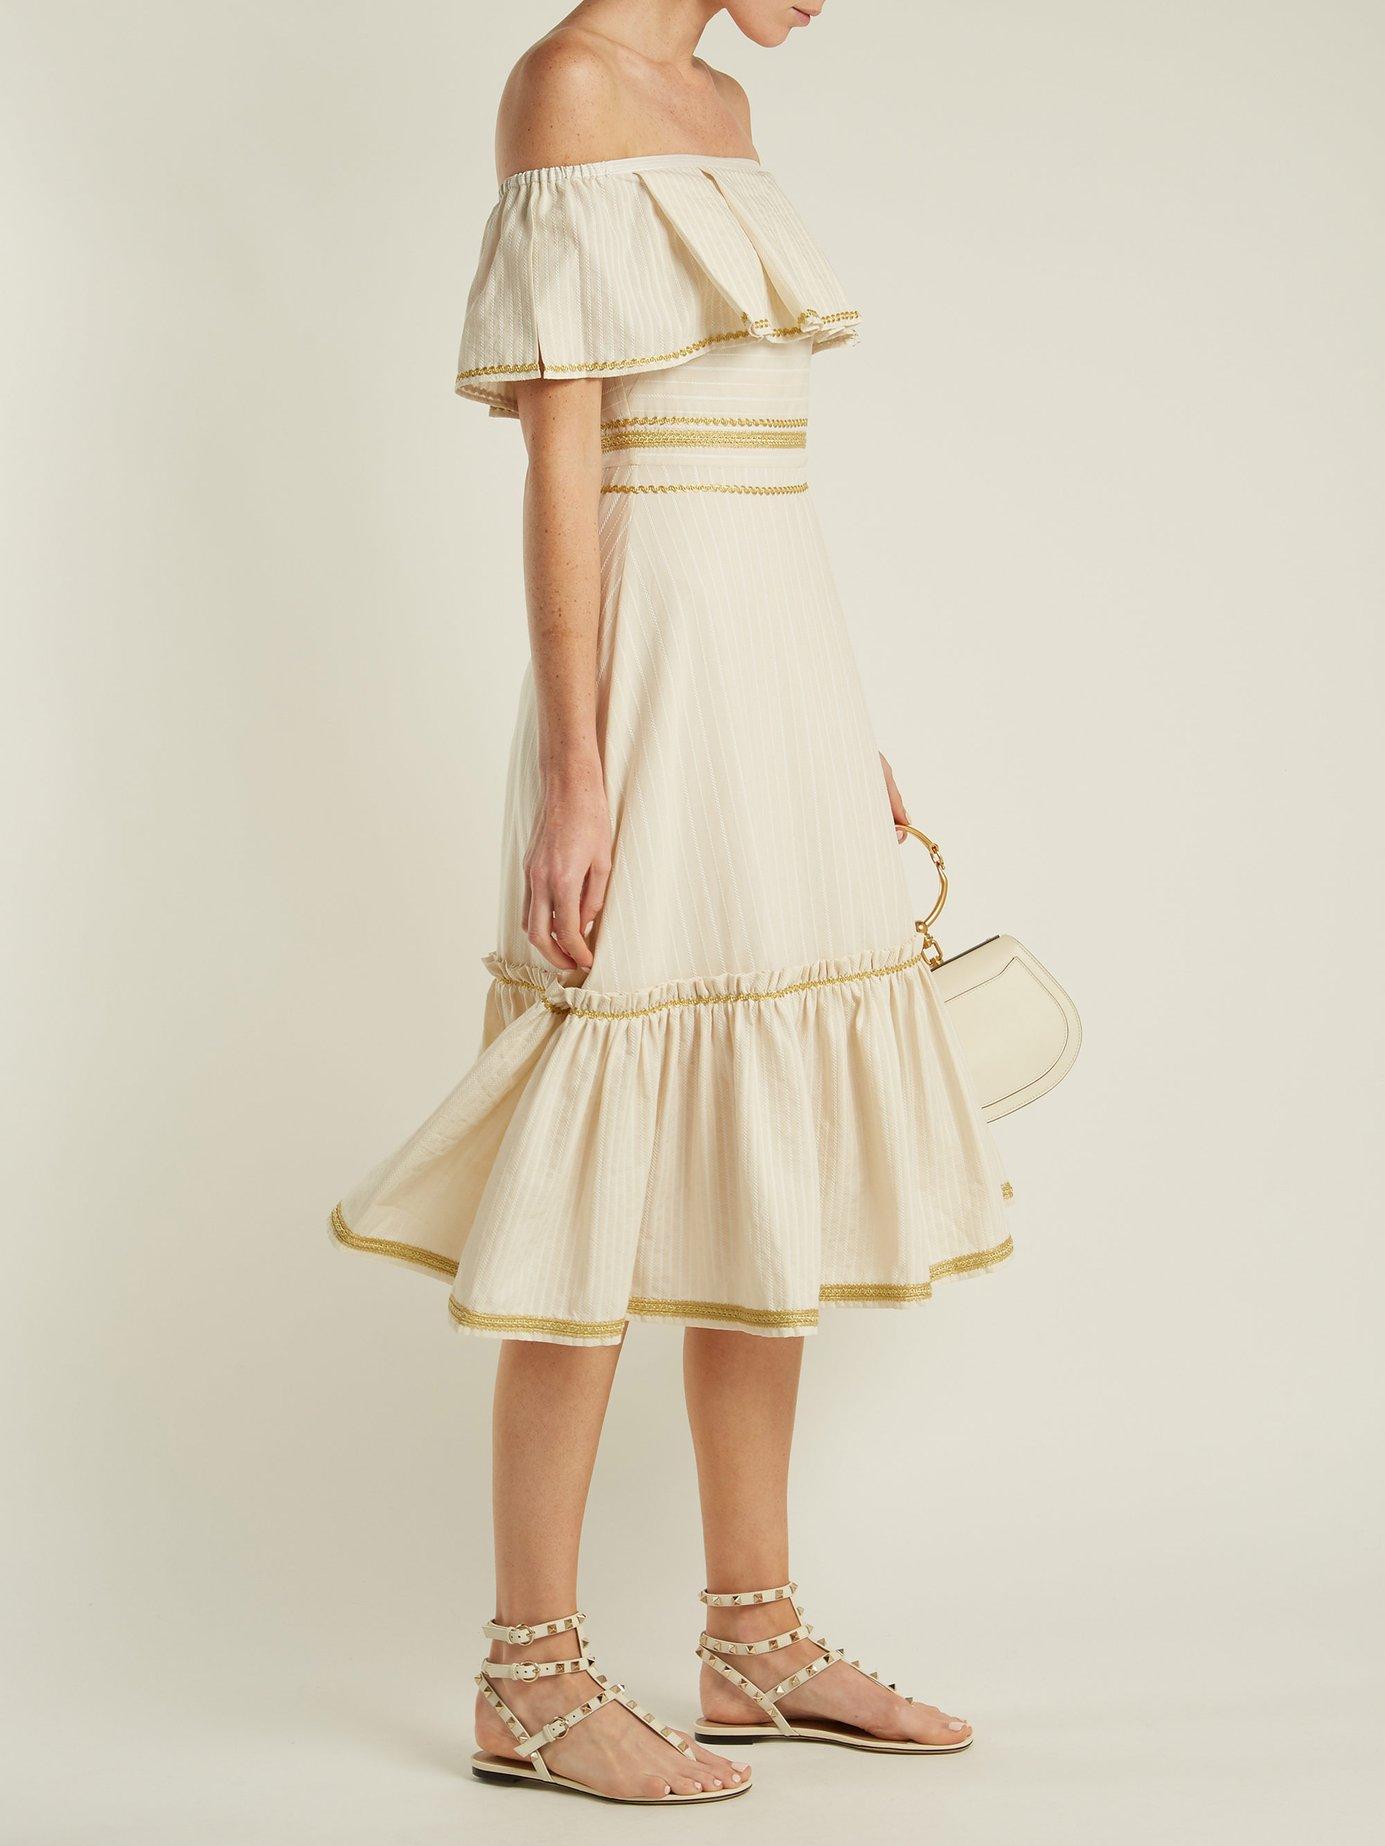 Leukes cotton dress by Zeus + Dione